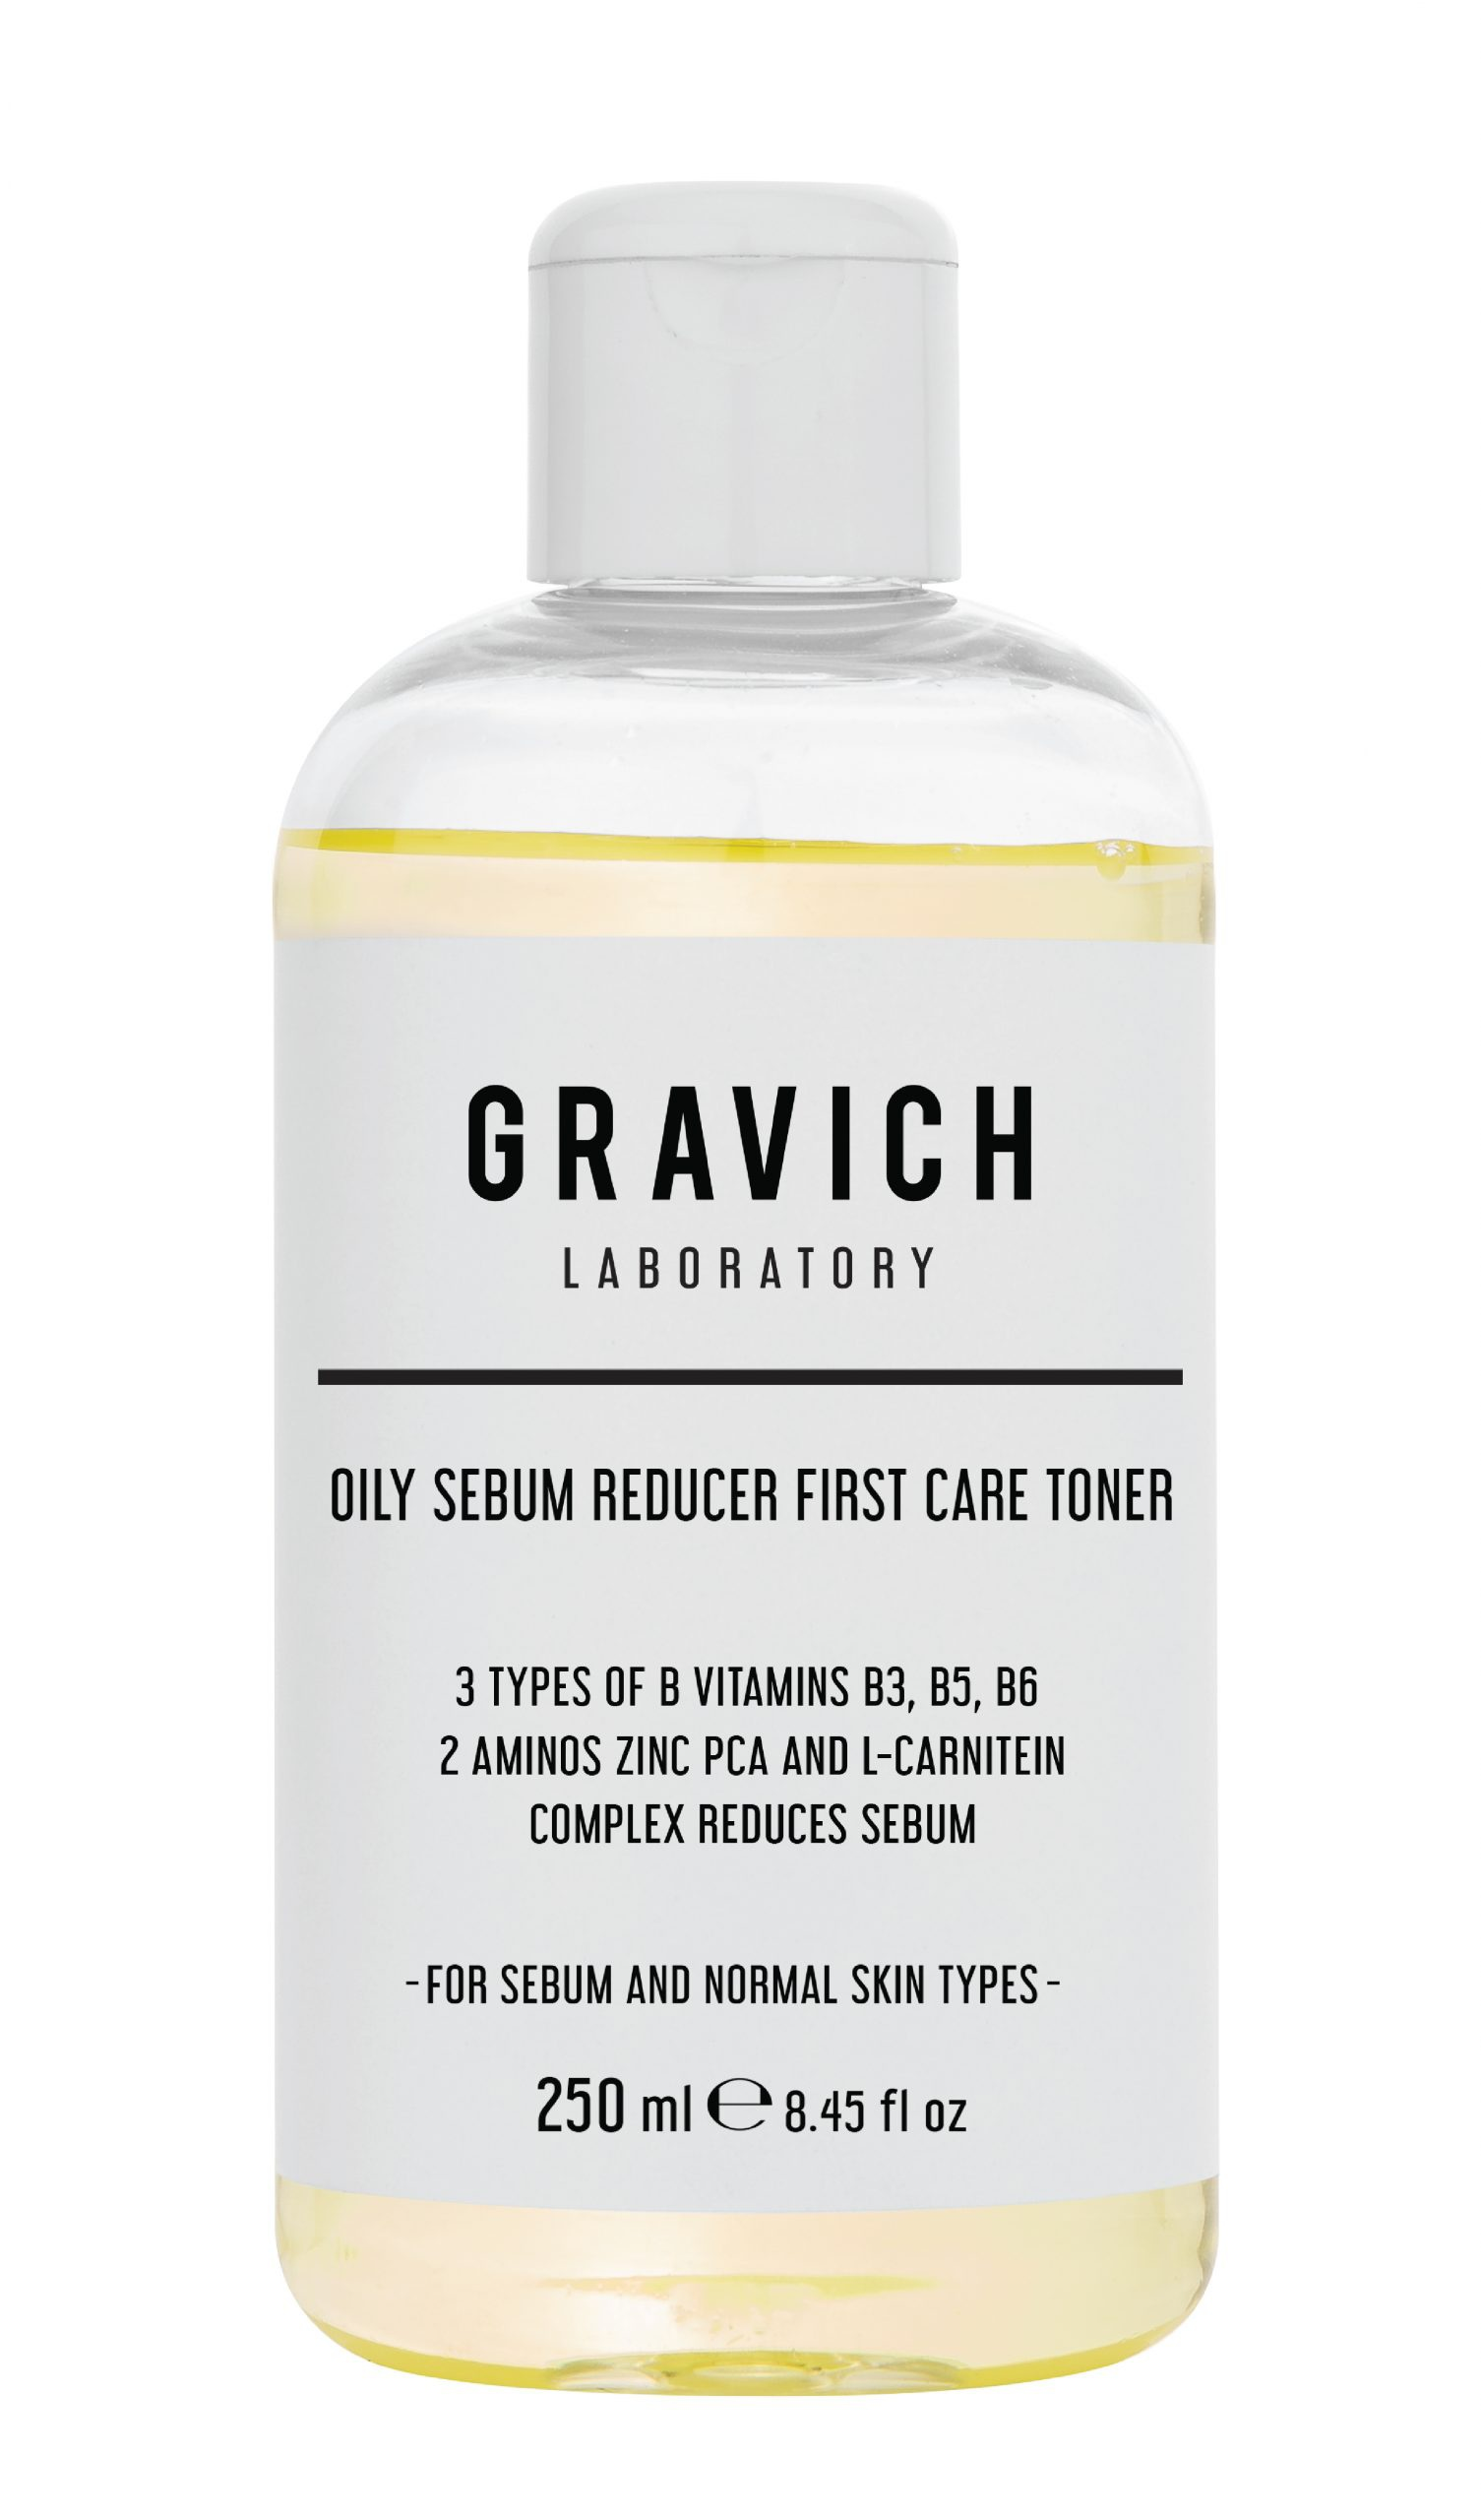 GRAVICH Oily Sebum Reducer First Care Toner